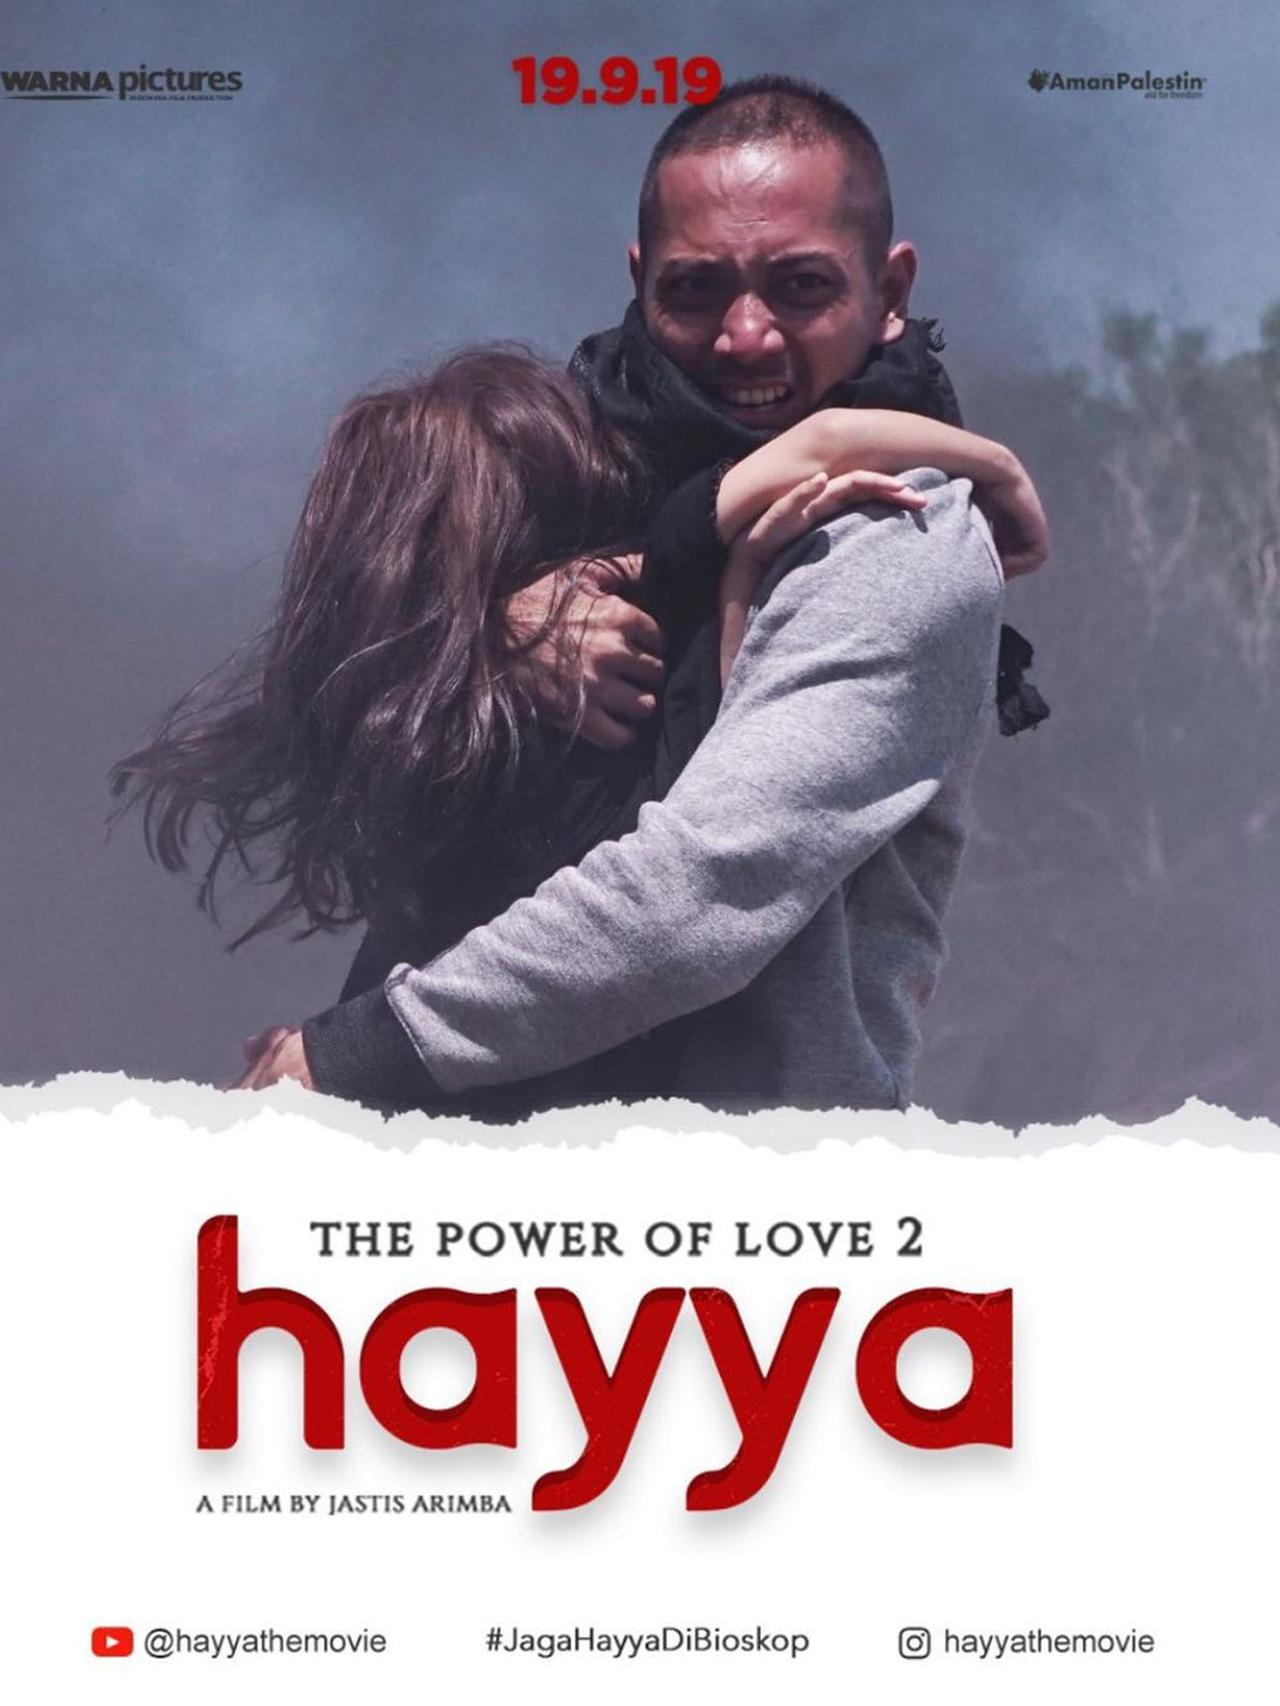 Hayya: The Power of Love 2 1